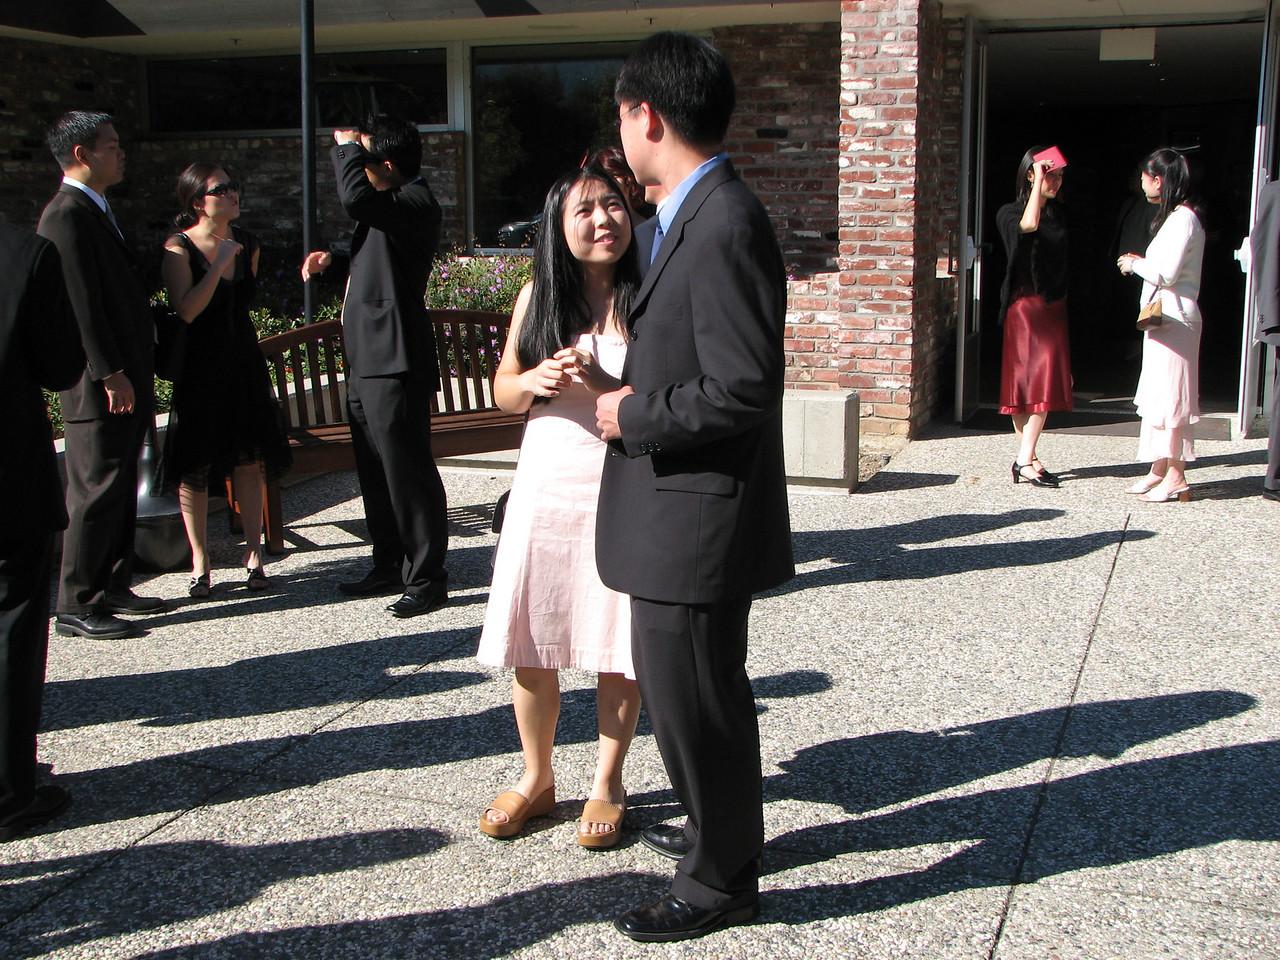 2006 10 08 Sun - Ceremony - Cynthia Cheung & Stephen Chang